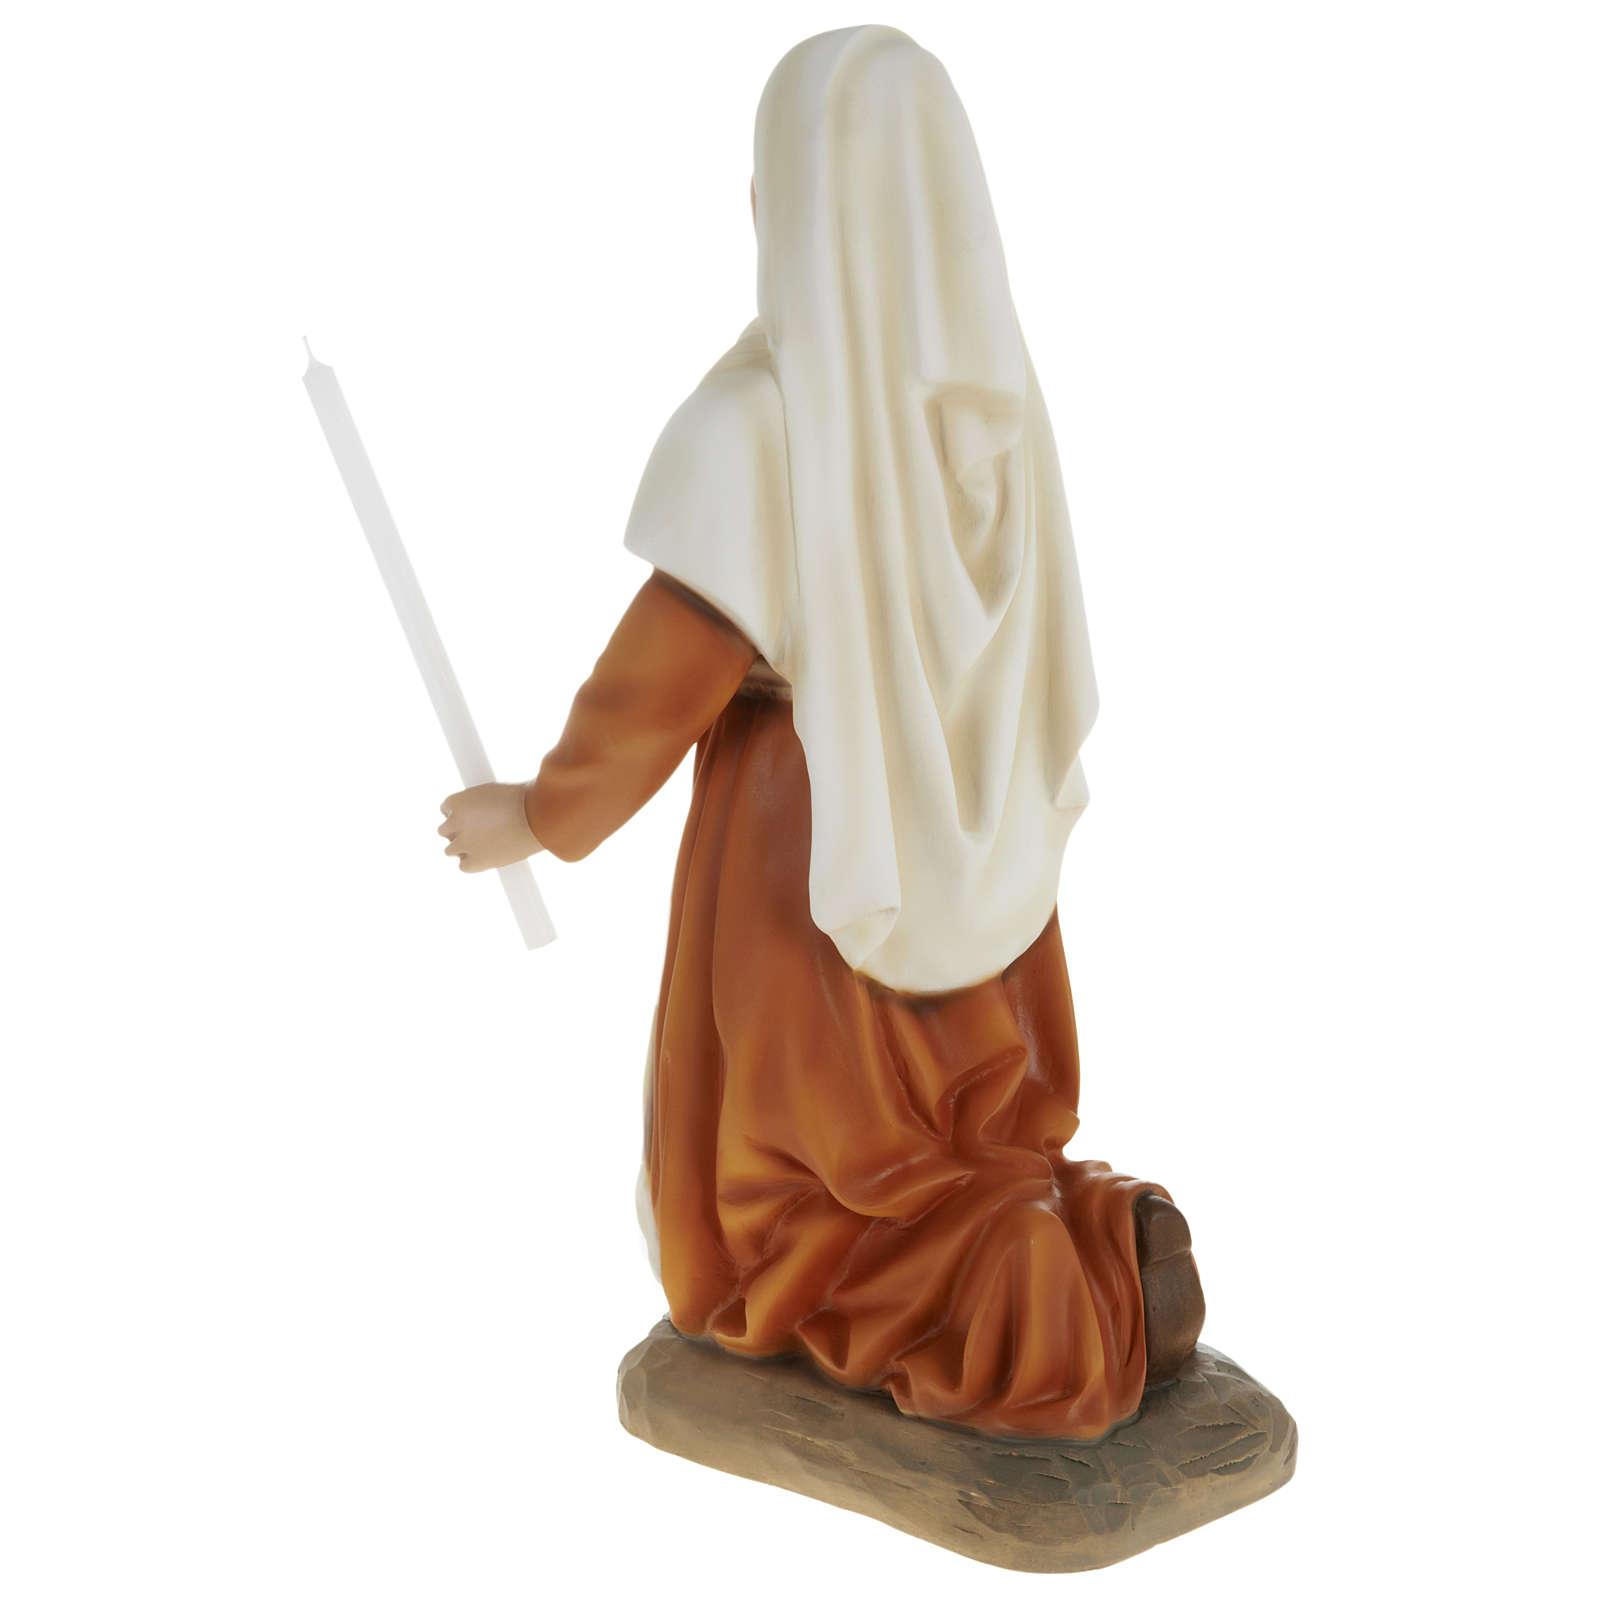 Statue of St. Bernadette in fibreglass 63 cm for EXTERNAL USE 4